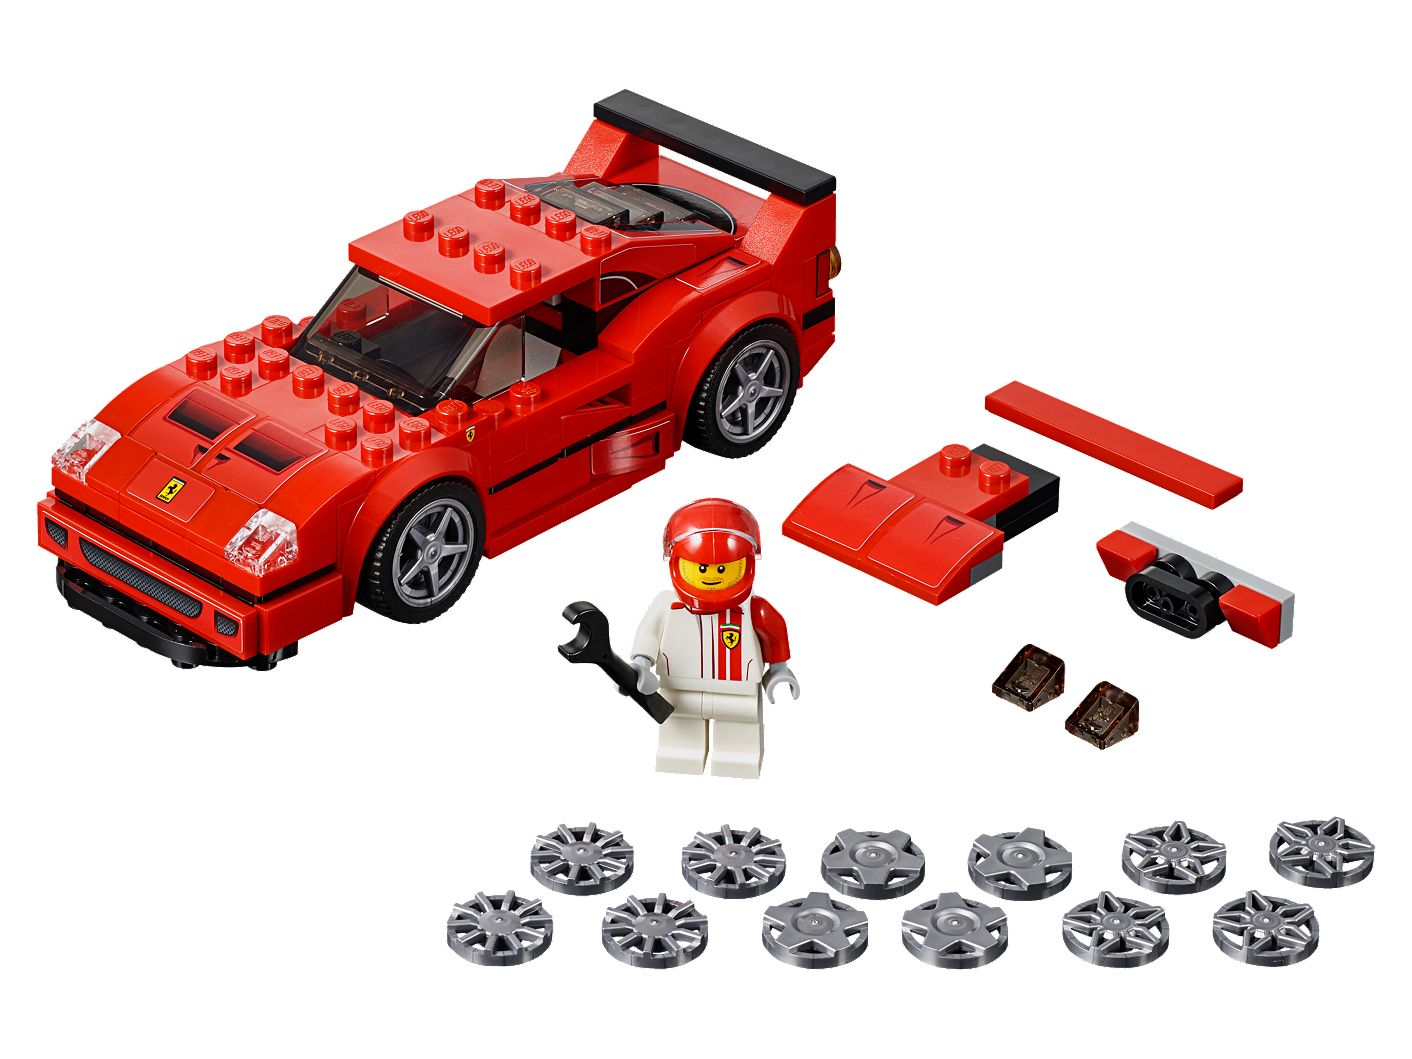 LEGO nopeus dating